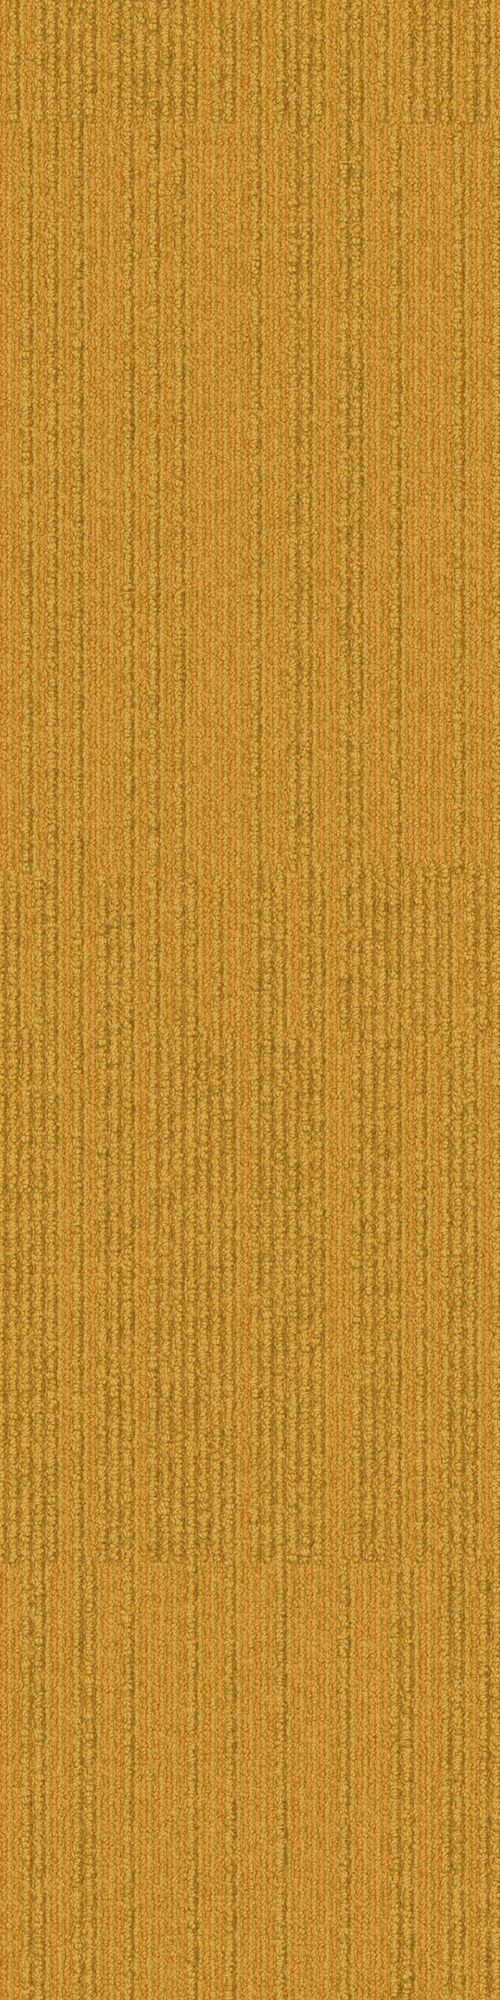 Interface carpet tile: On Line Color name: Marigold